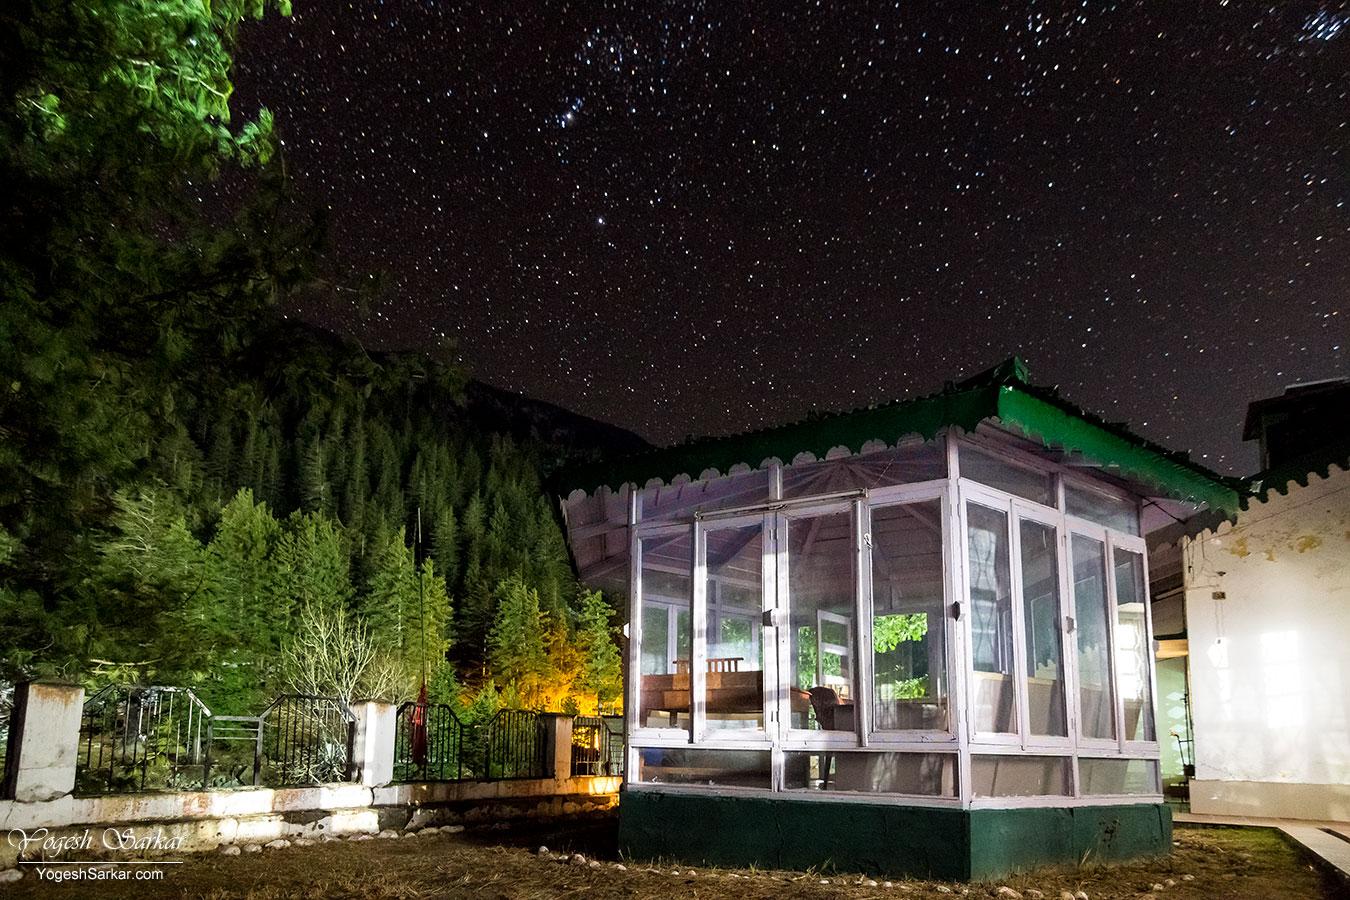 night-sky-gmvn-harsil.jpg